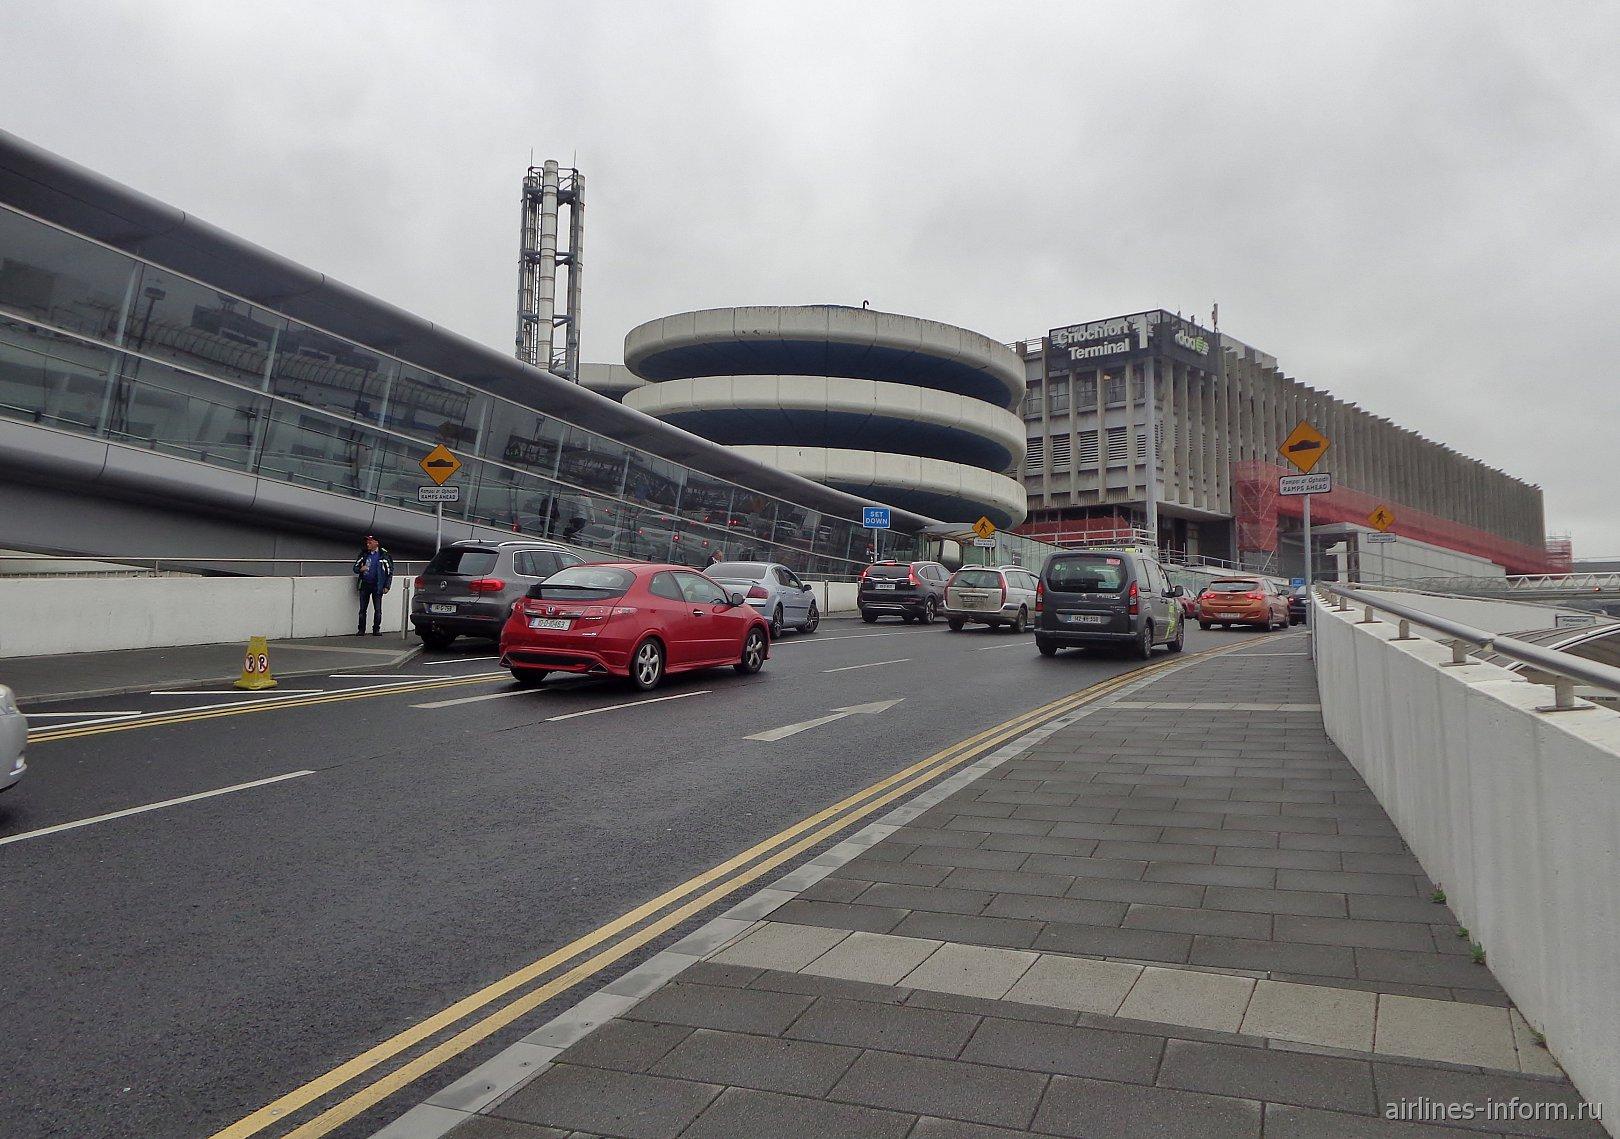 Переход между терминалами 1 и 2 аэропорта Дублин